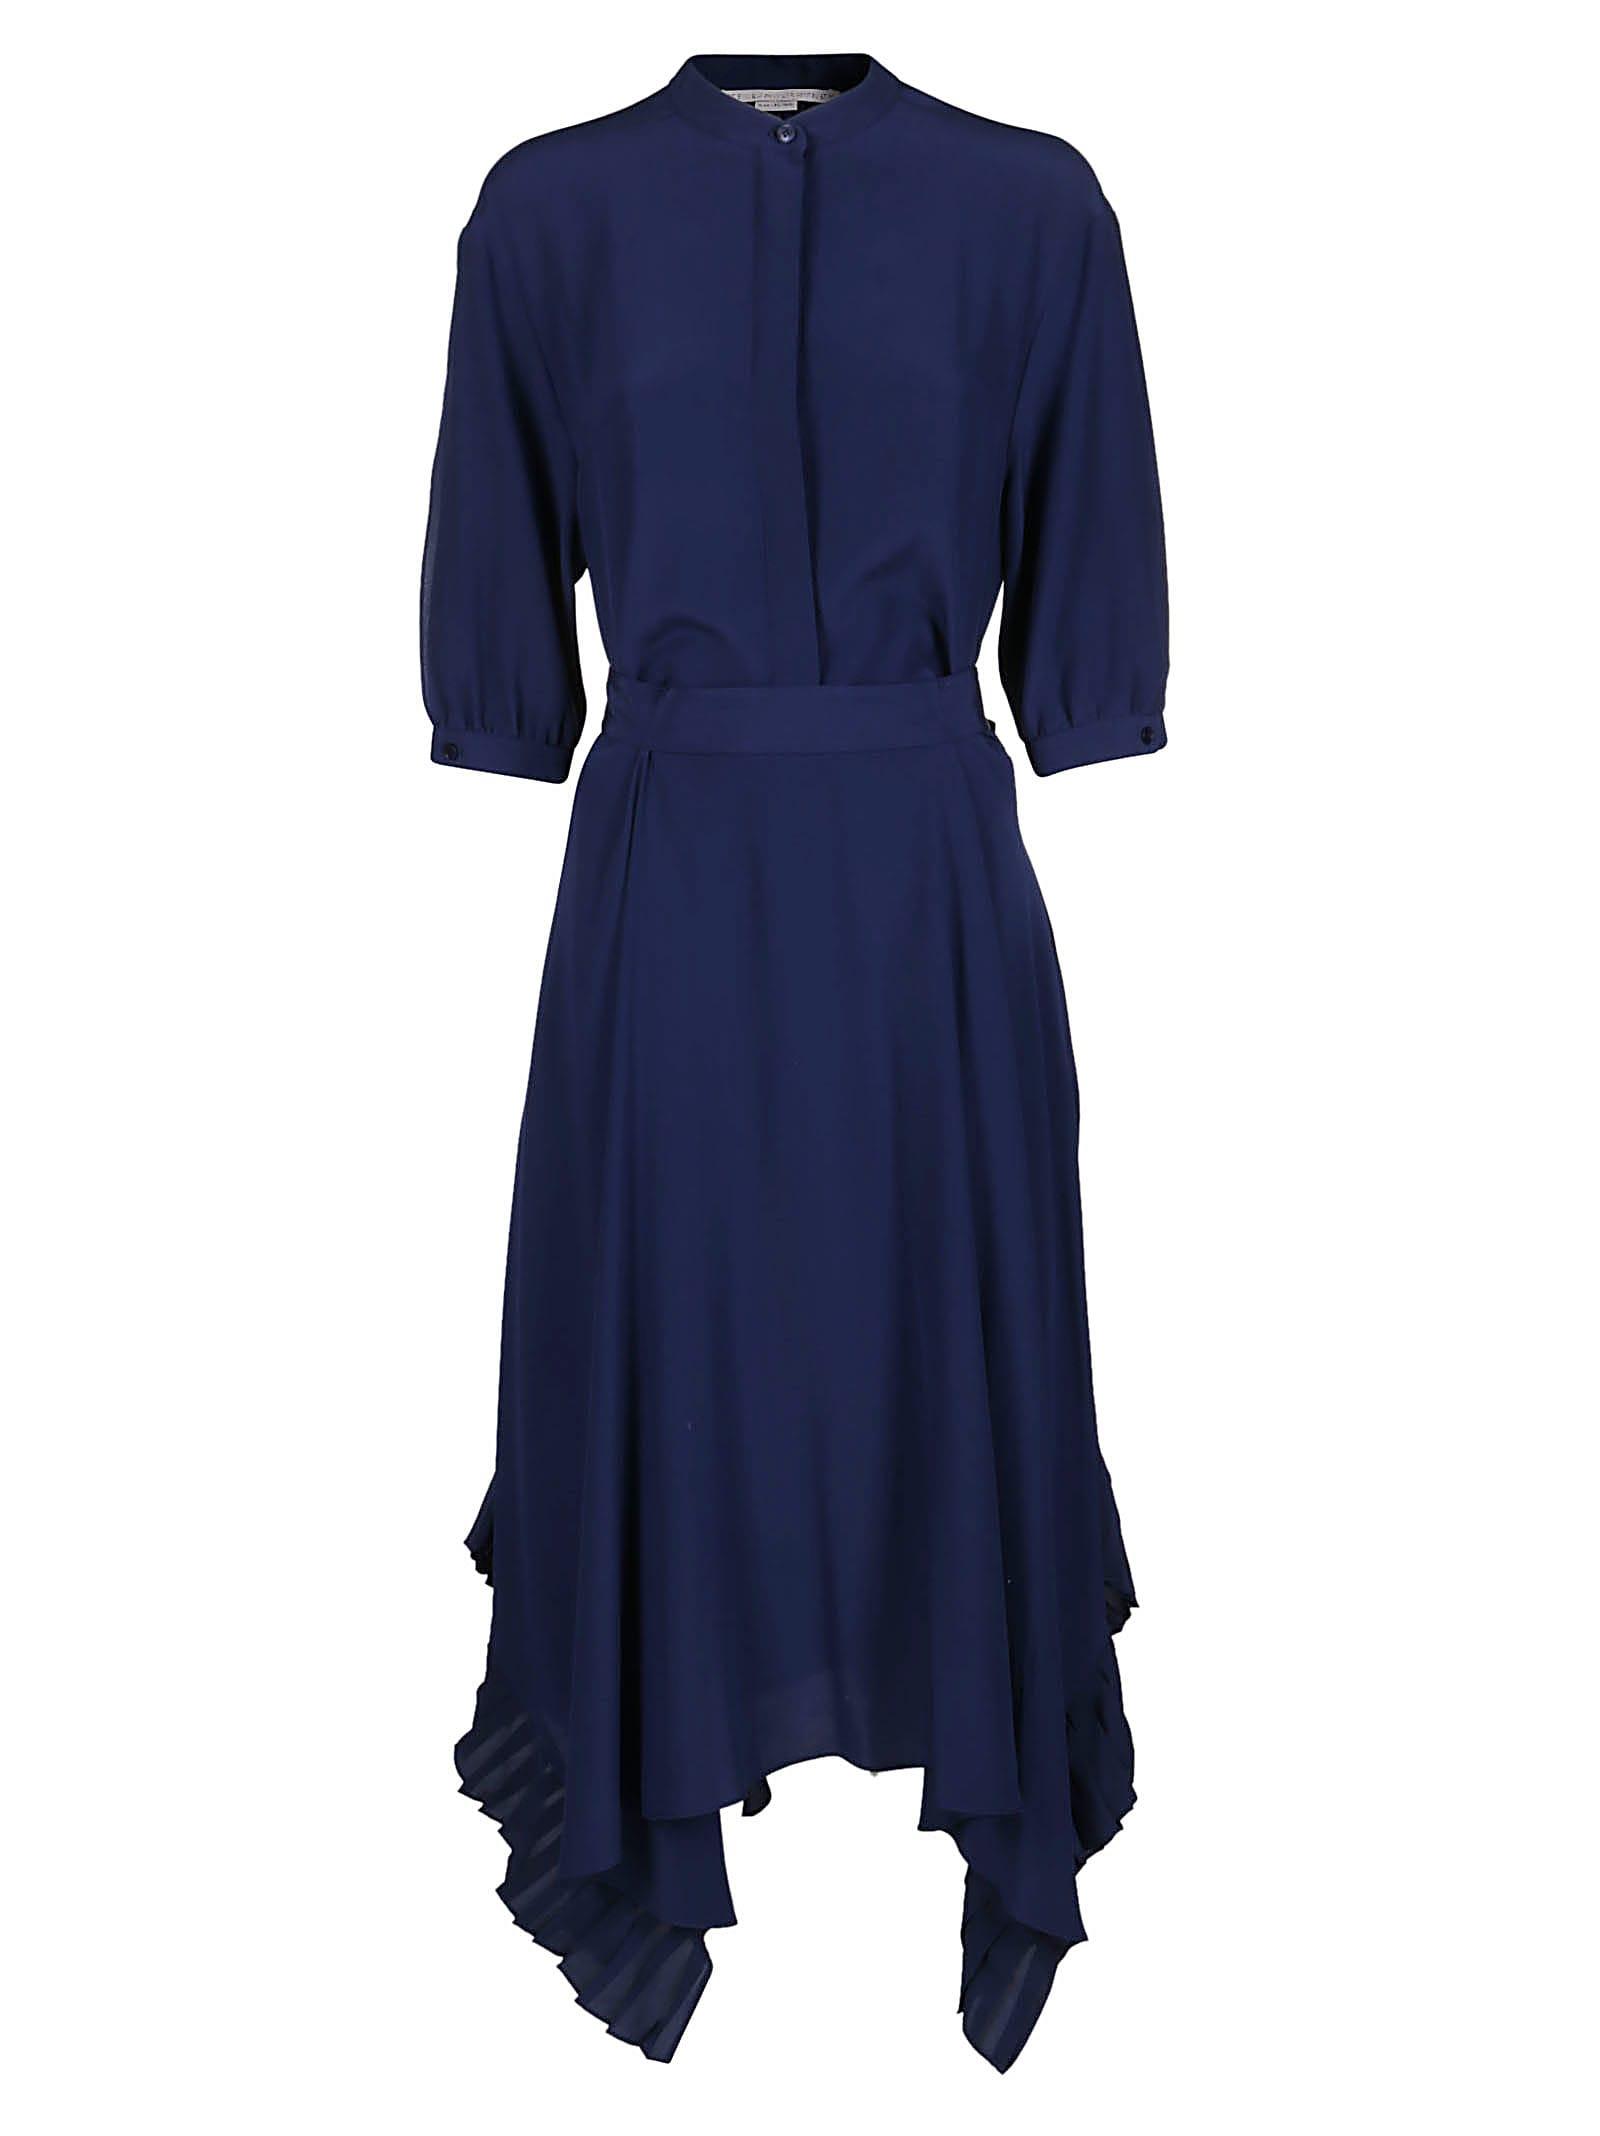 Stella McCartney Blue Silk Dress